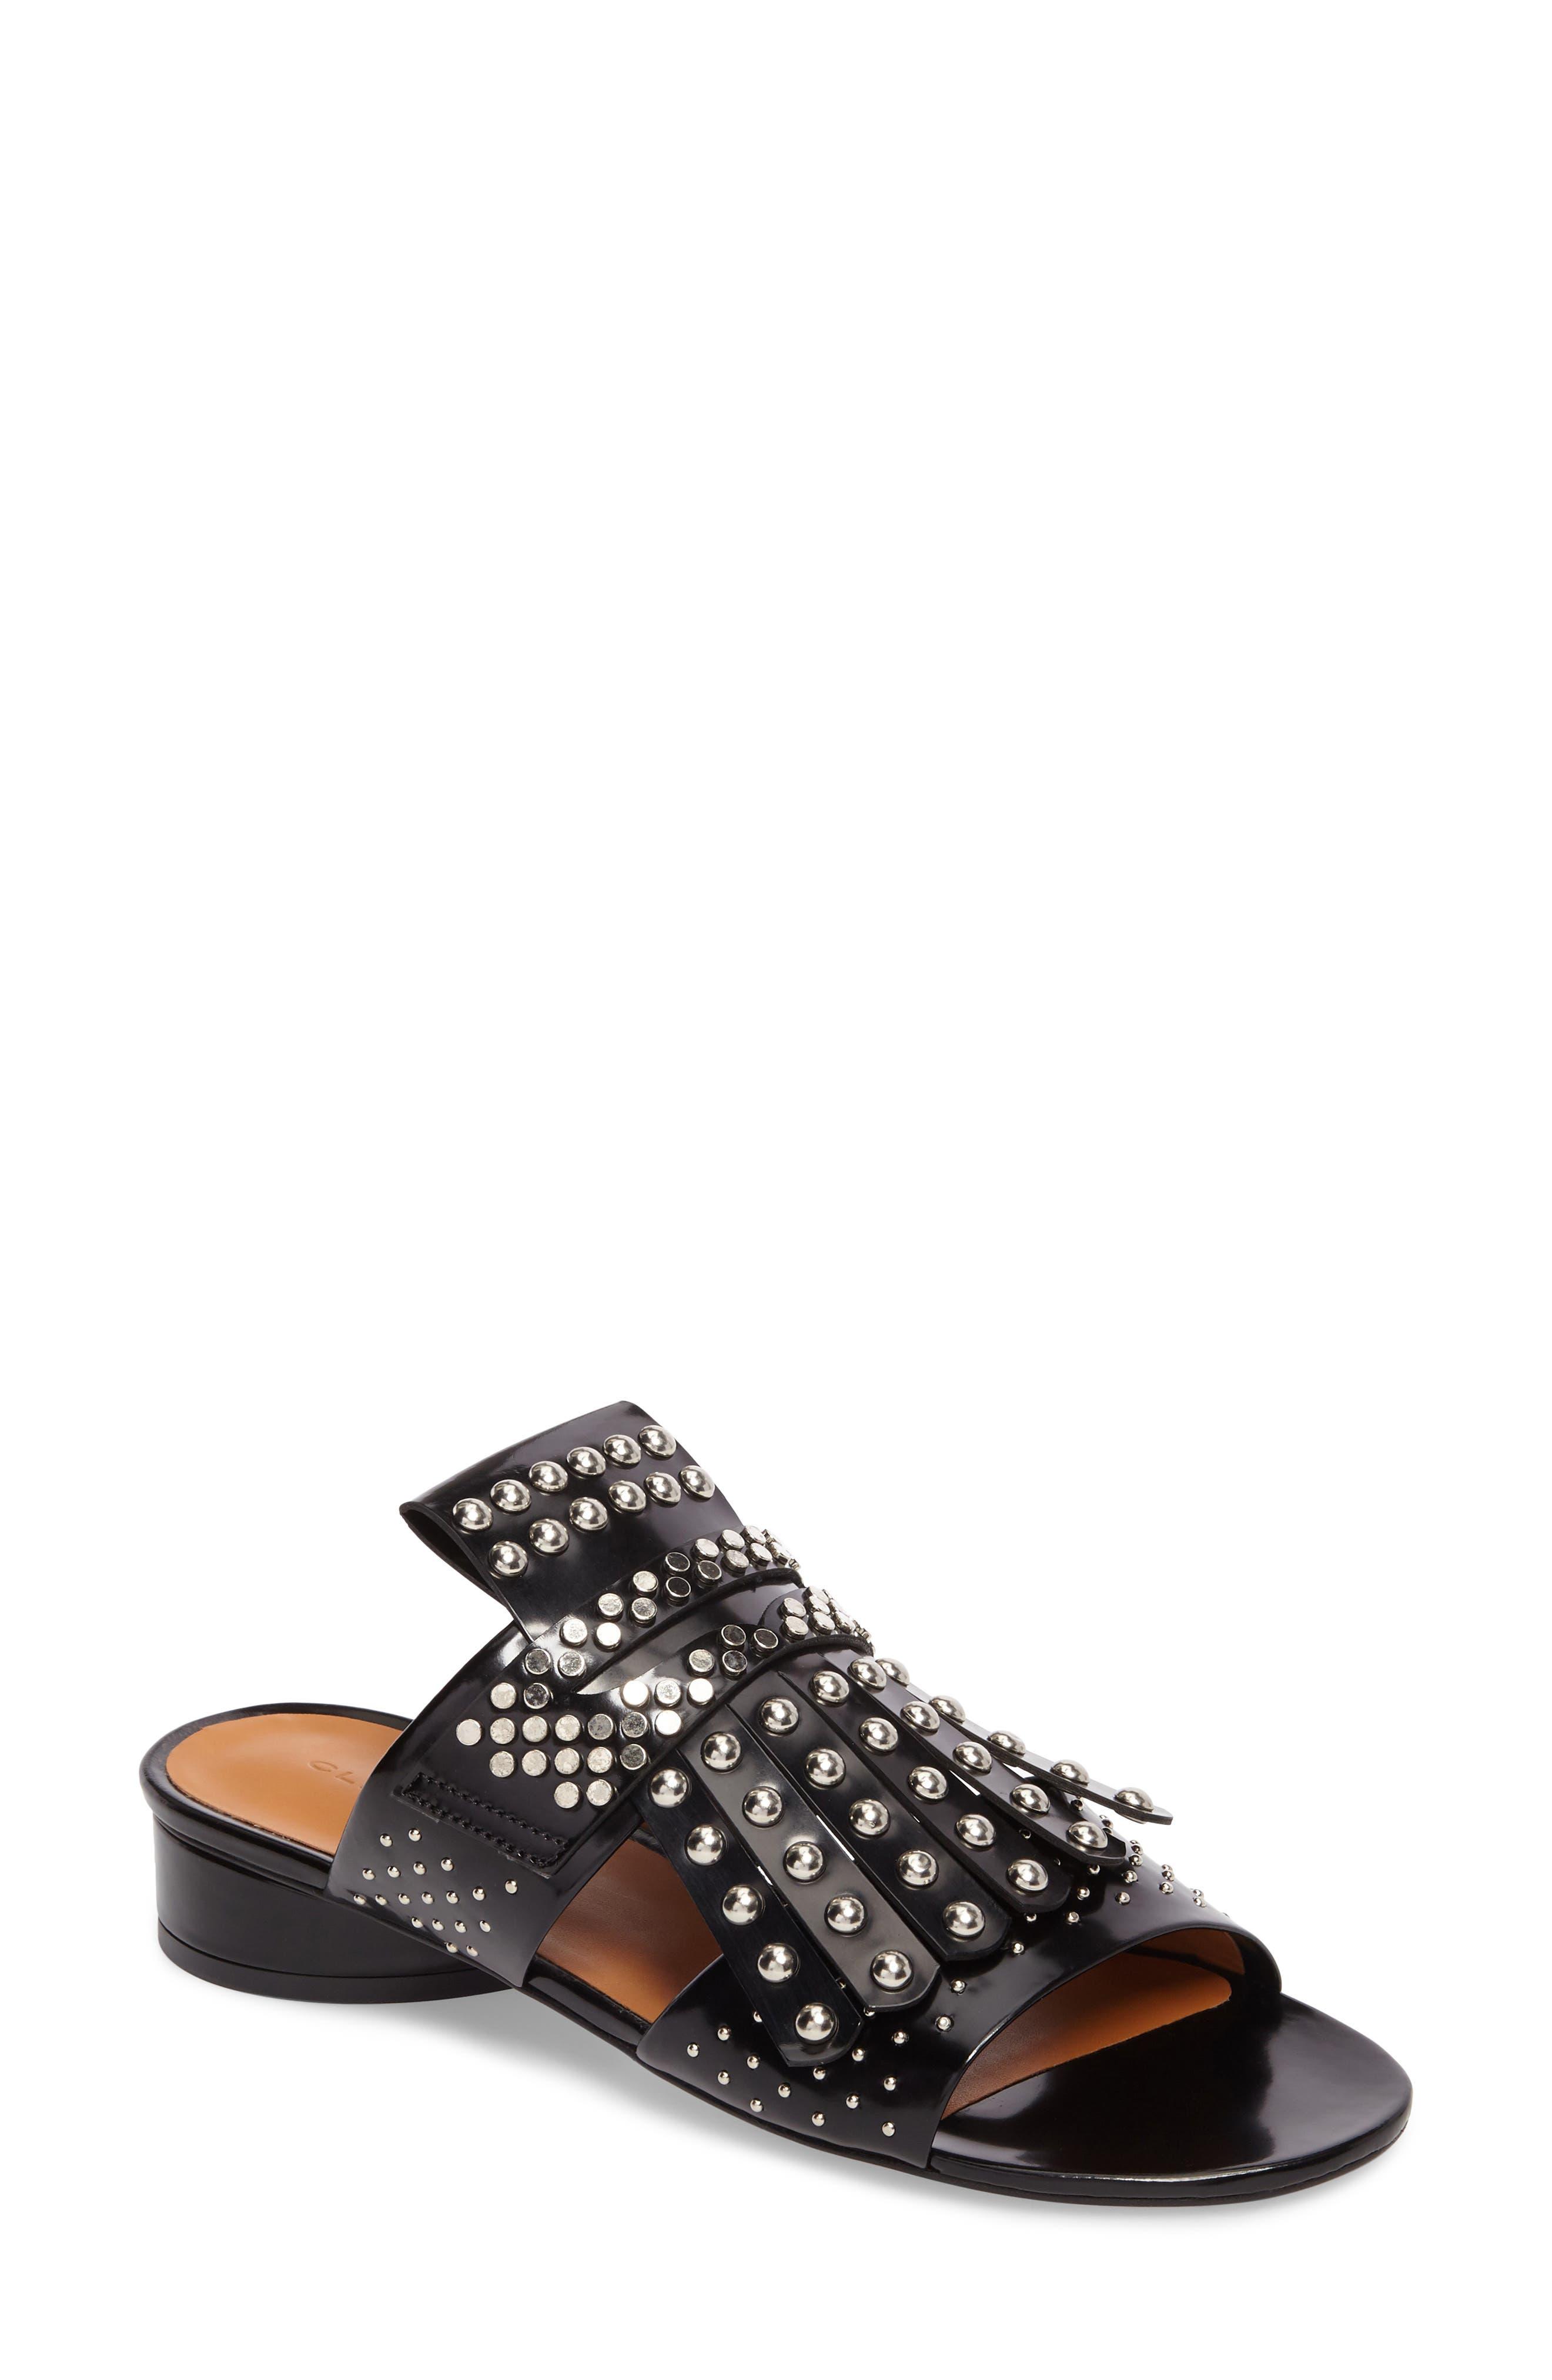 Figlouc Studded Sandal,                             Main thumbnail 1, color,                             Black